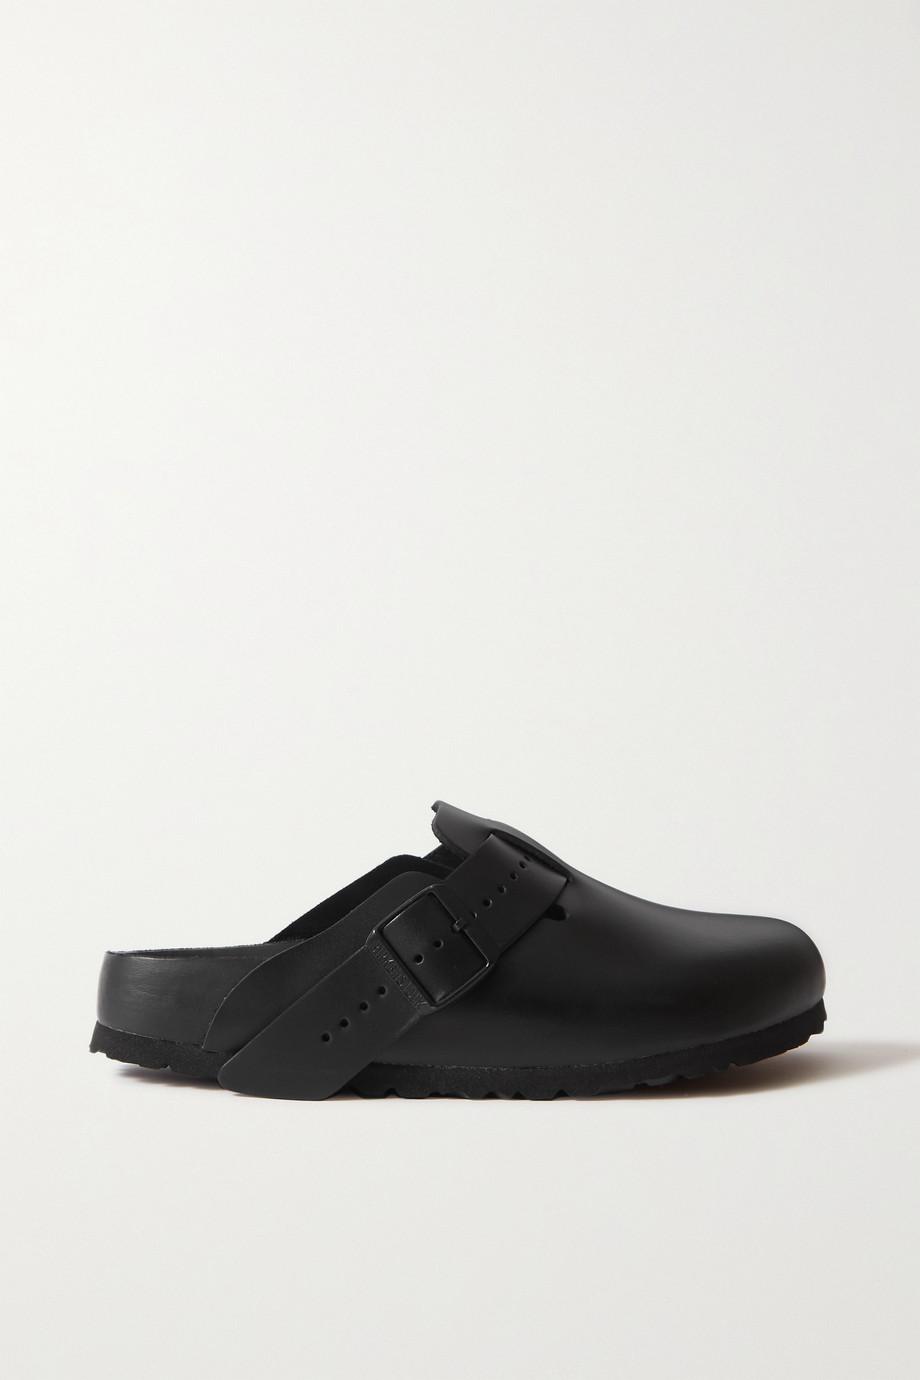 Rick Owens + Birkenstock Boston leather slippers